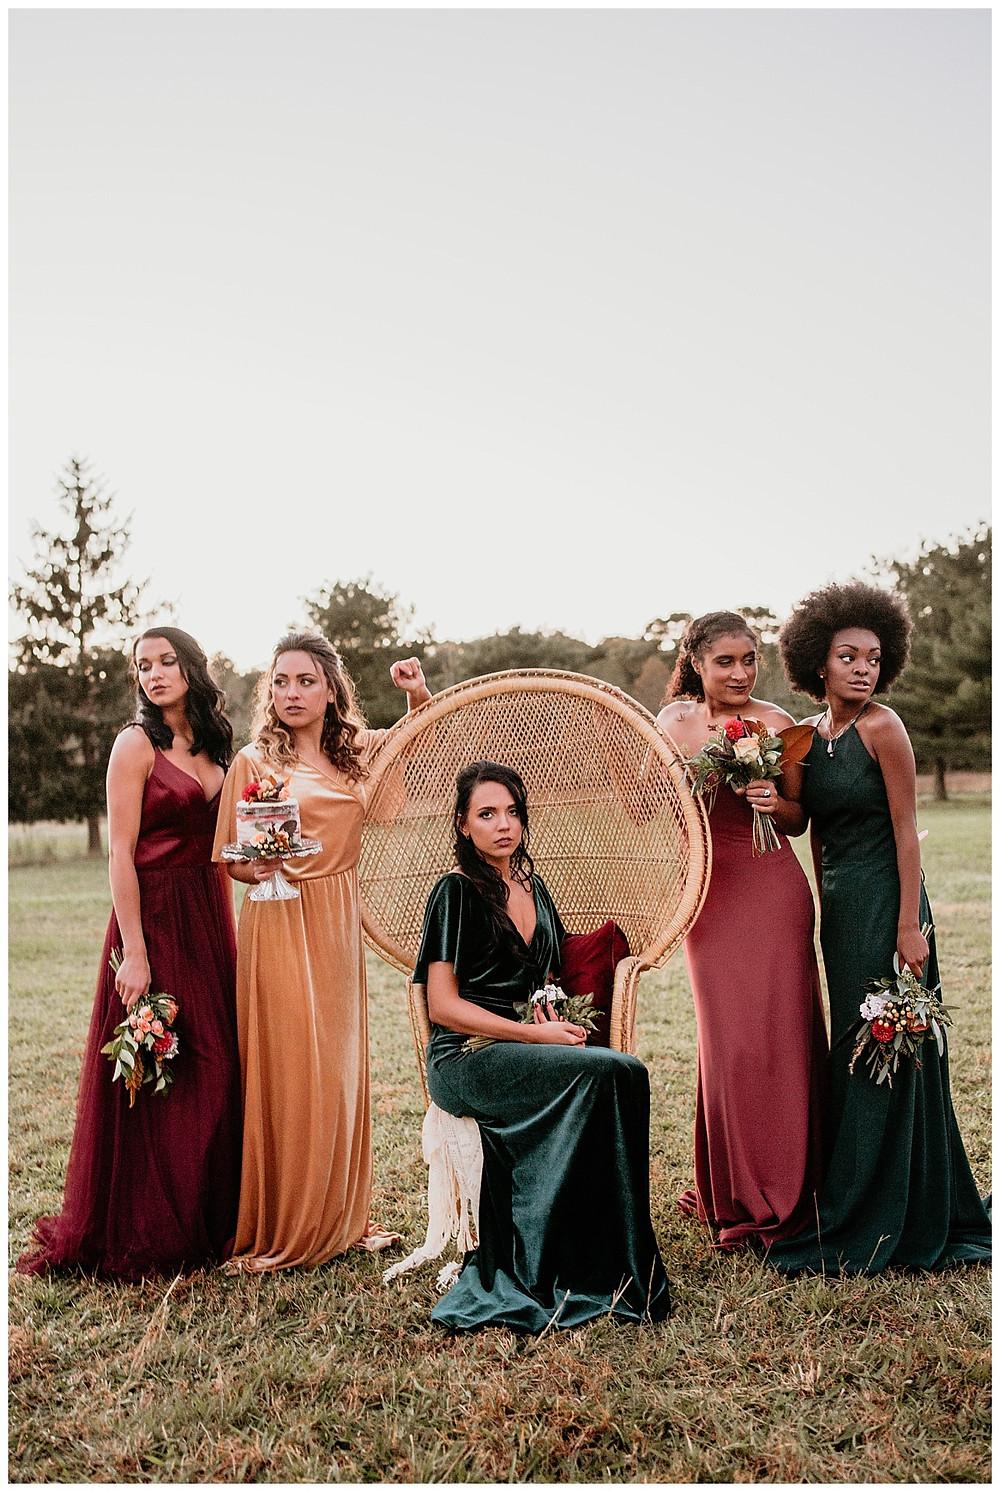 Boho Bridesmaids, Wicker Chair